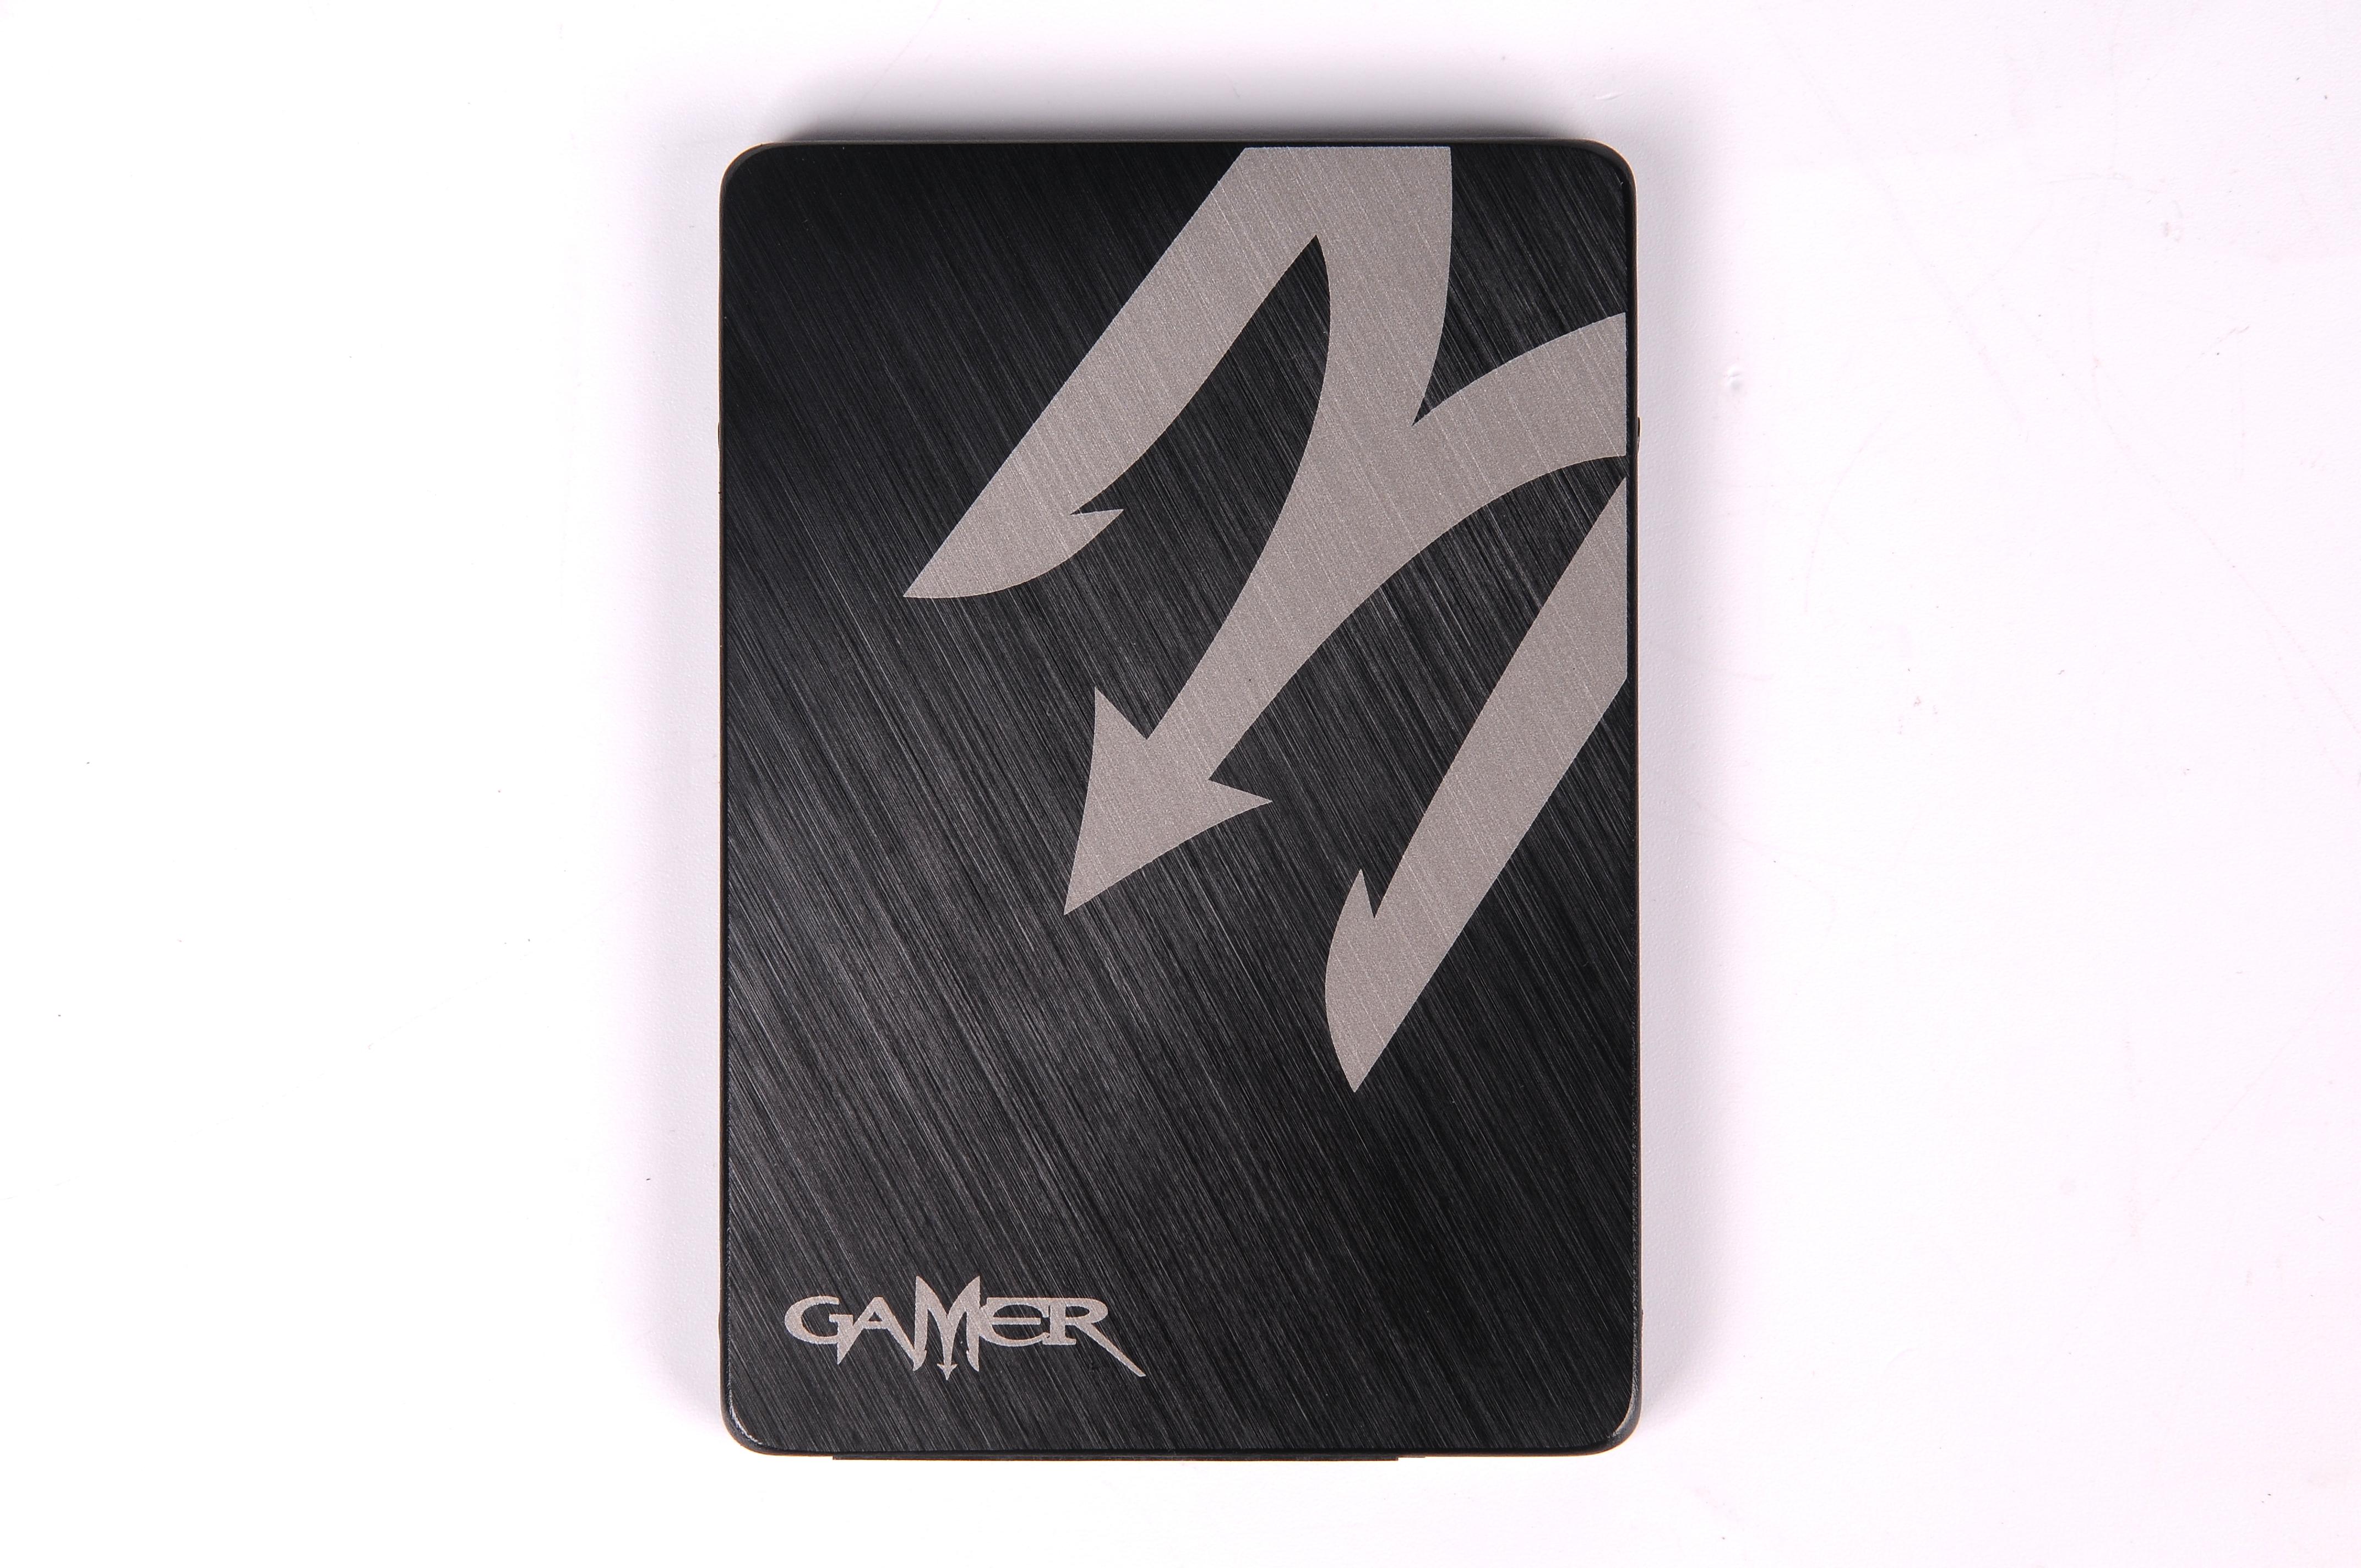 GALAX 影驰 GAMER SSD L 240GB SSD固态硬盘 评测